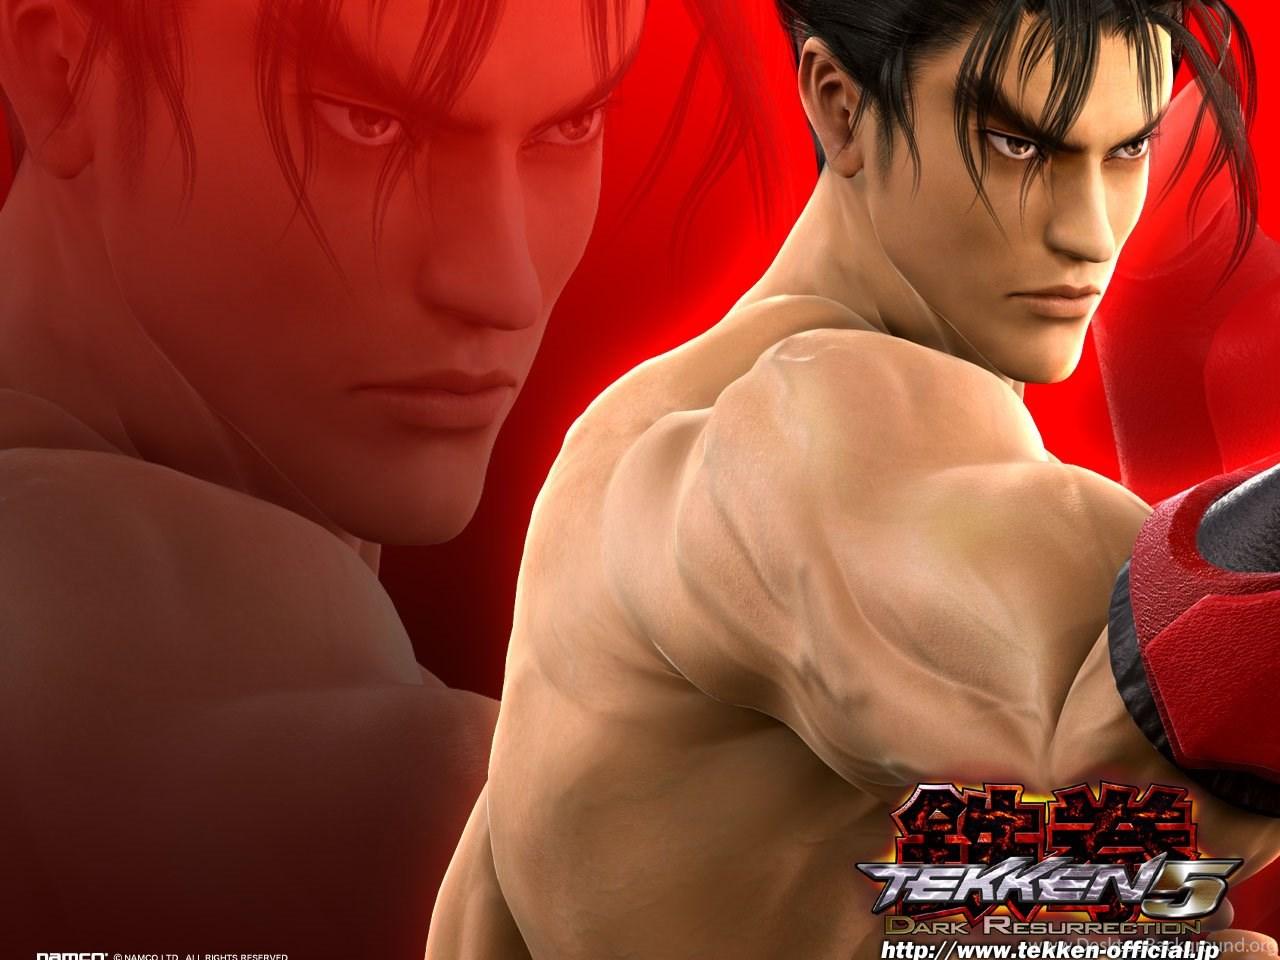 Jin Kazama Free Tekken 5 Dark Resurrection Wallpapers Gallery